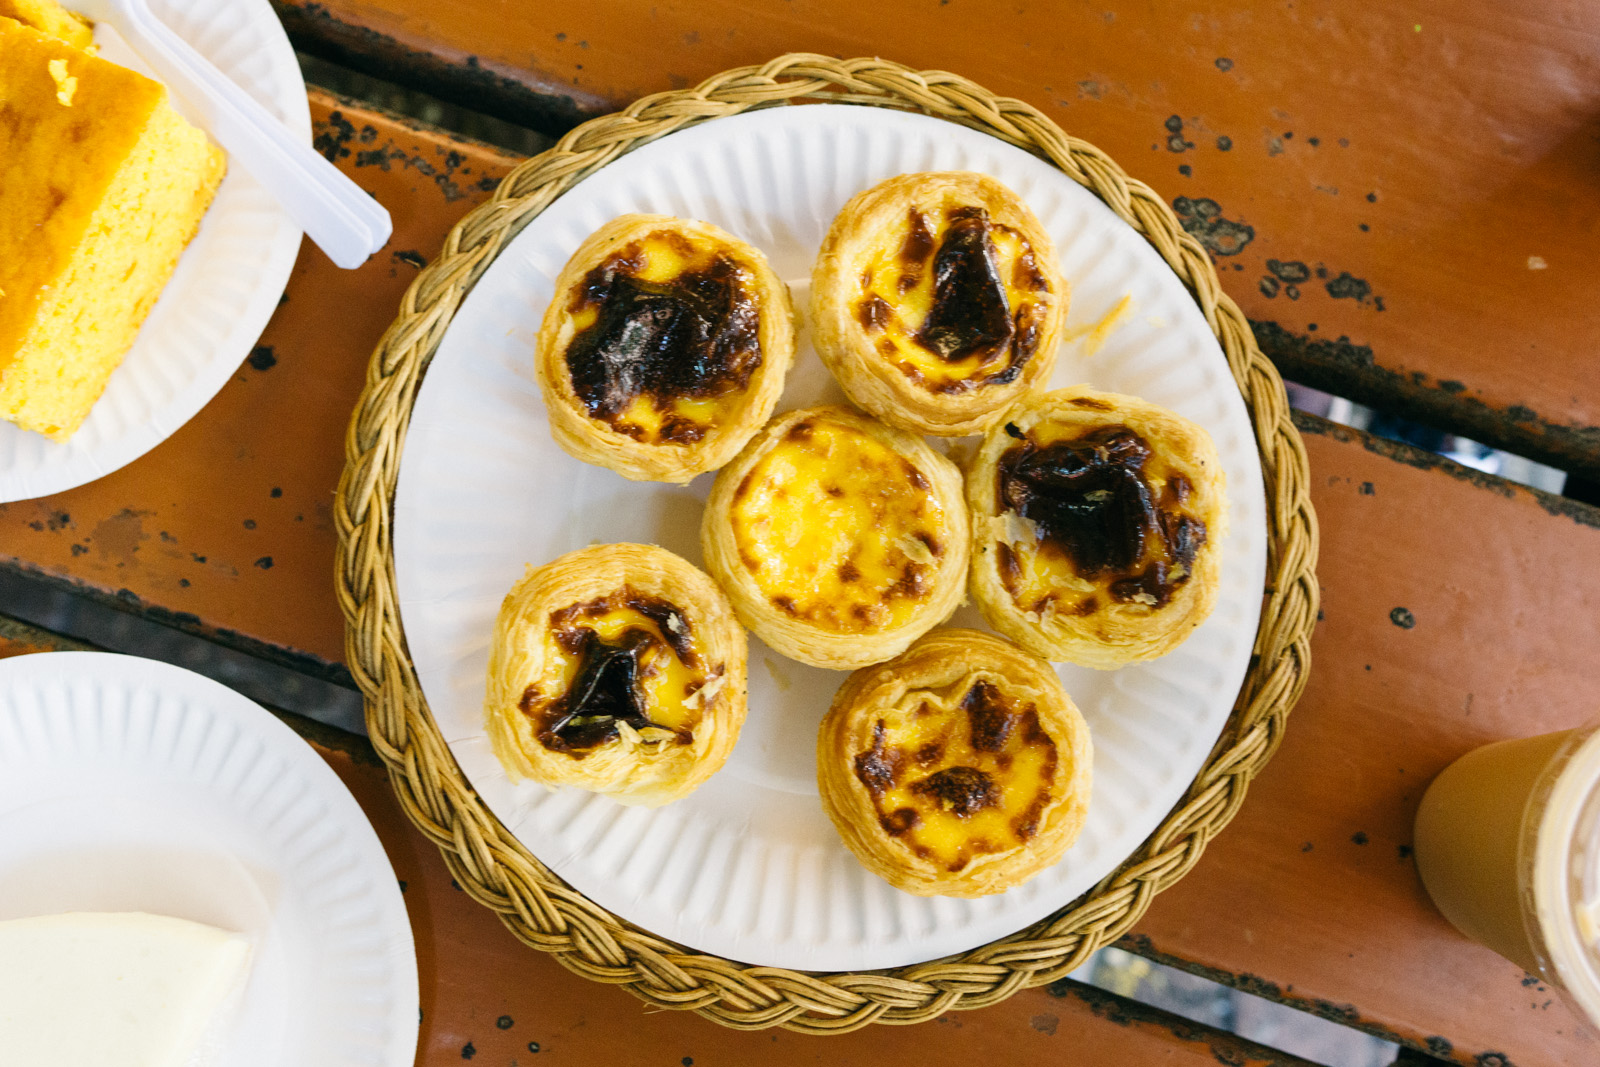 that-food-cray-margarets-cafe-e-nata-macau-portuguese-egg-tarts-7